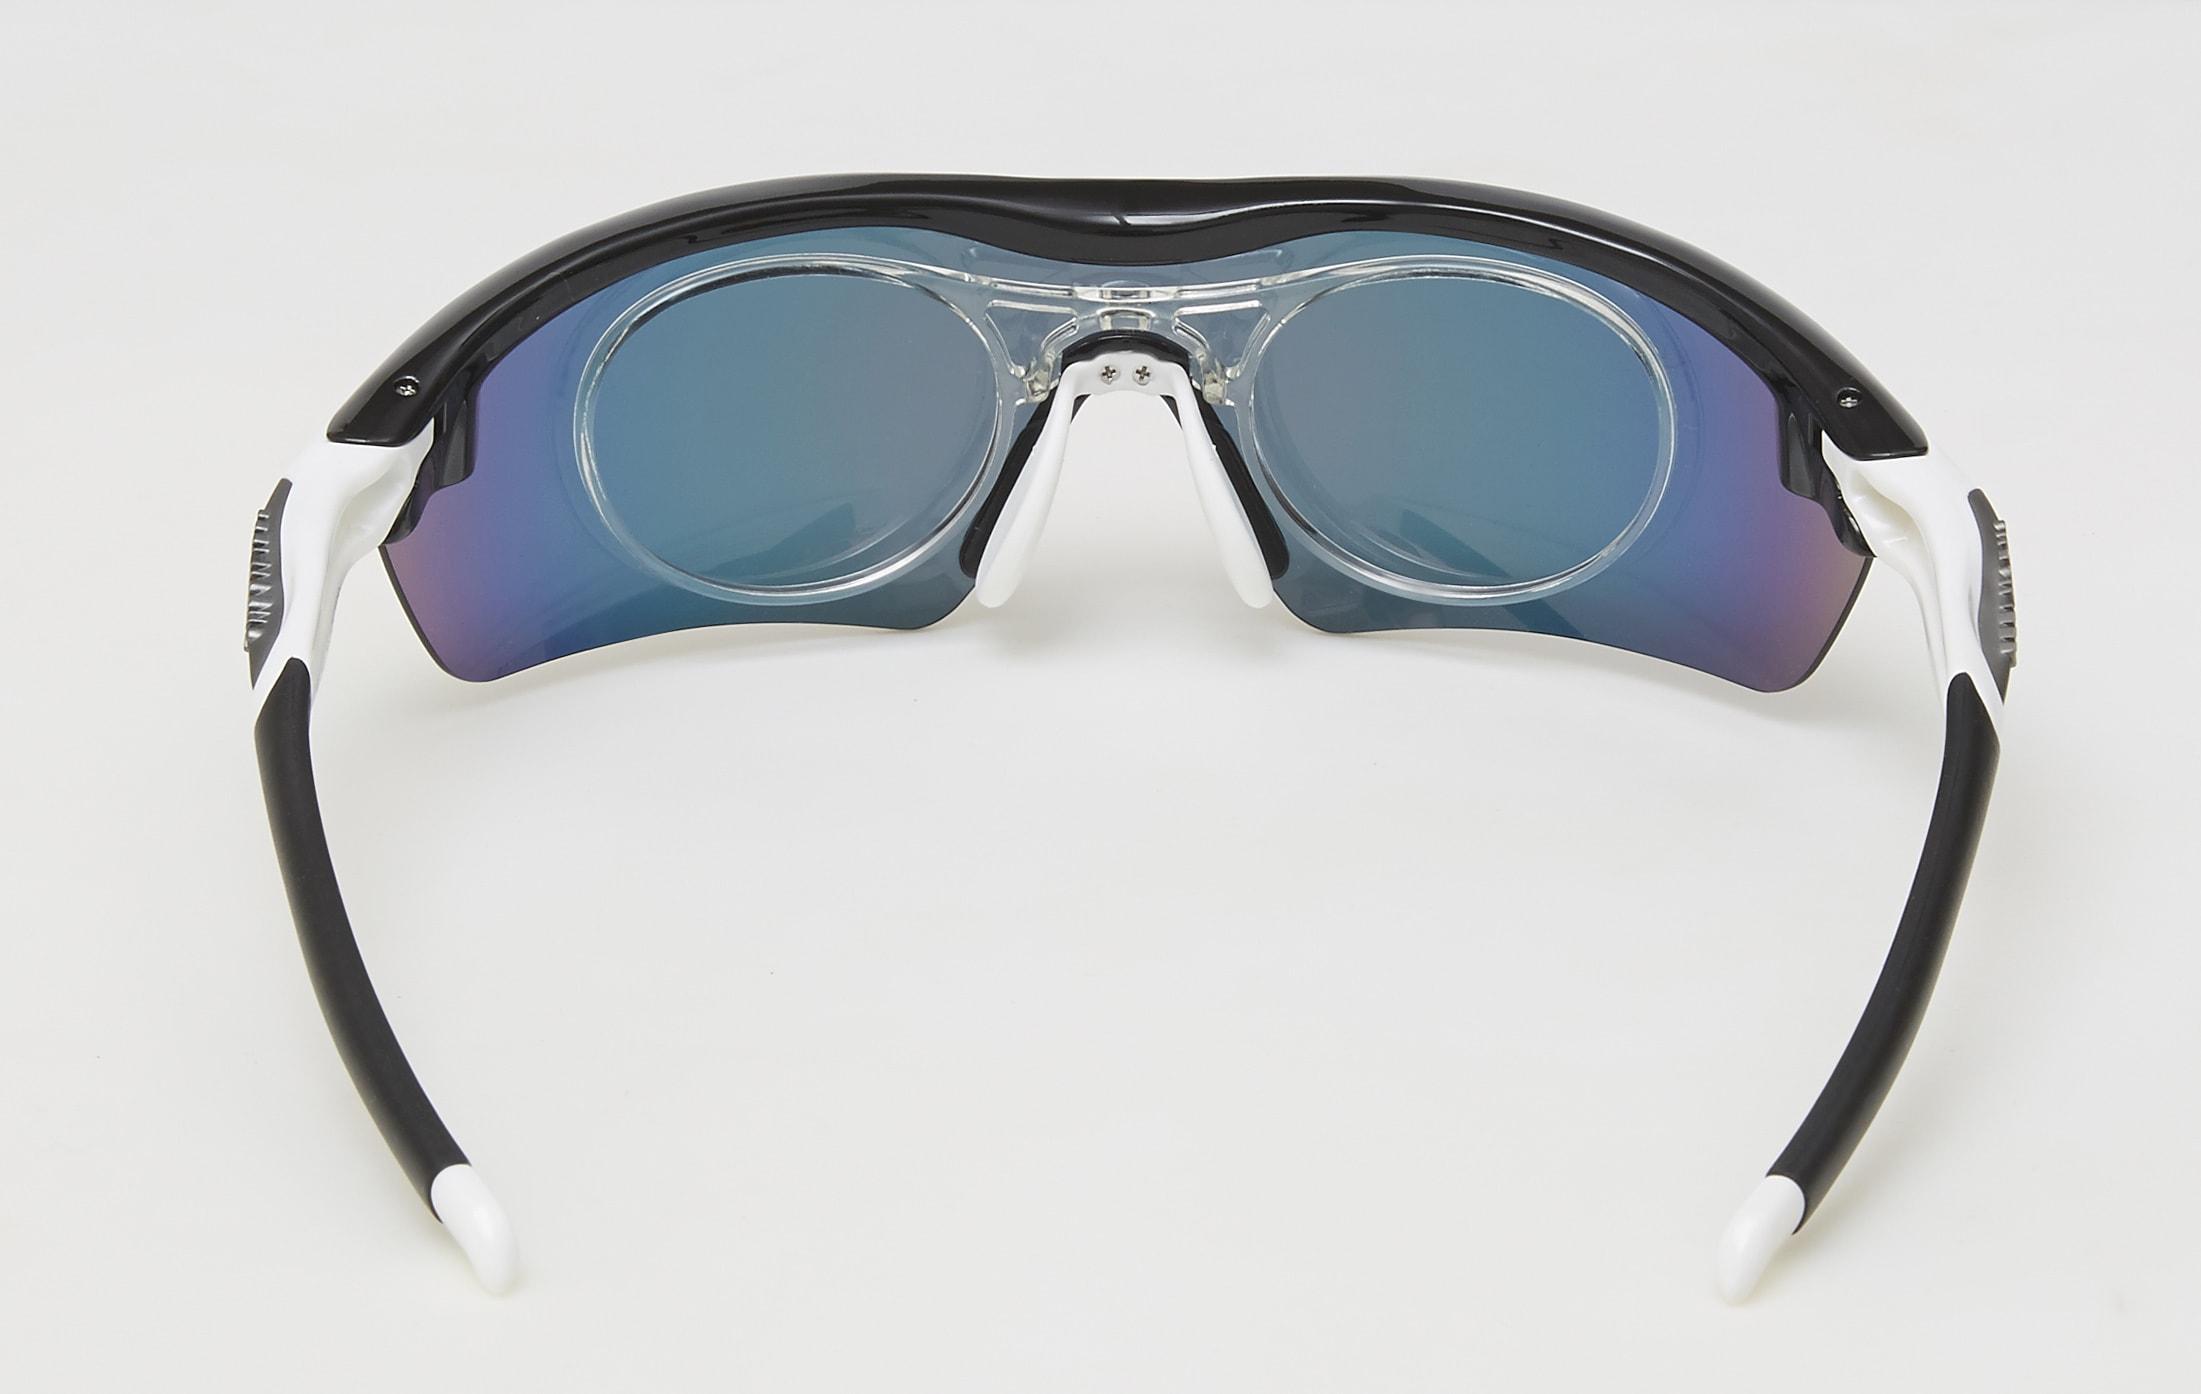 clip optico feel morys ms-048 negra blanca